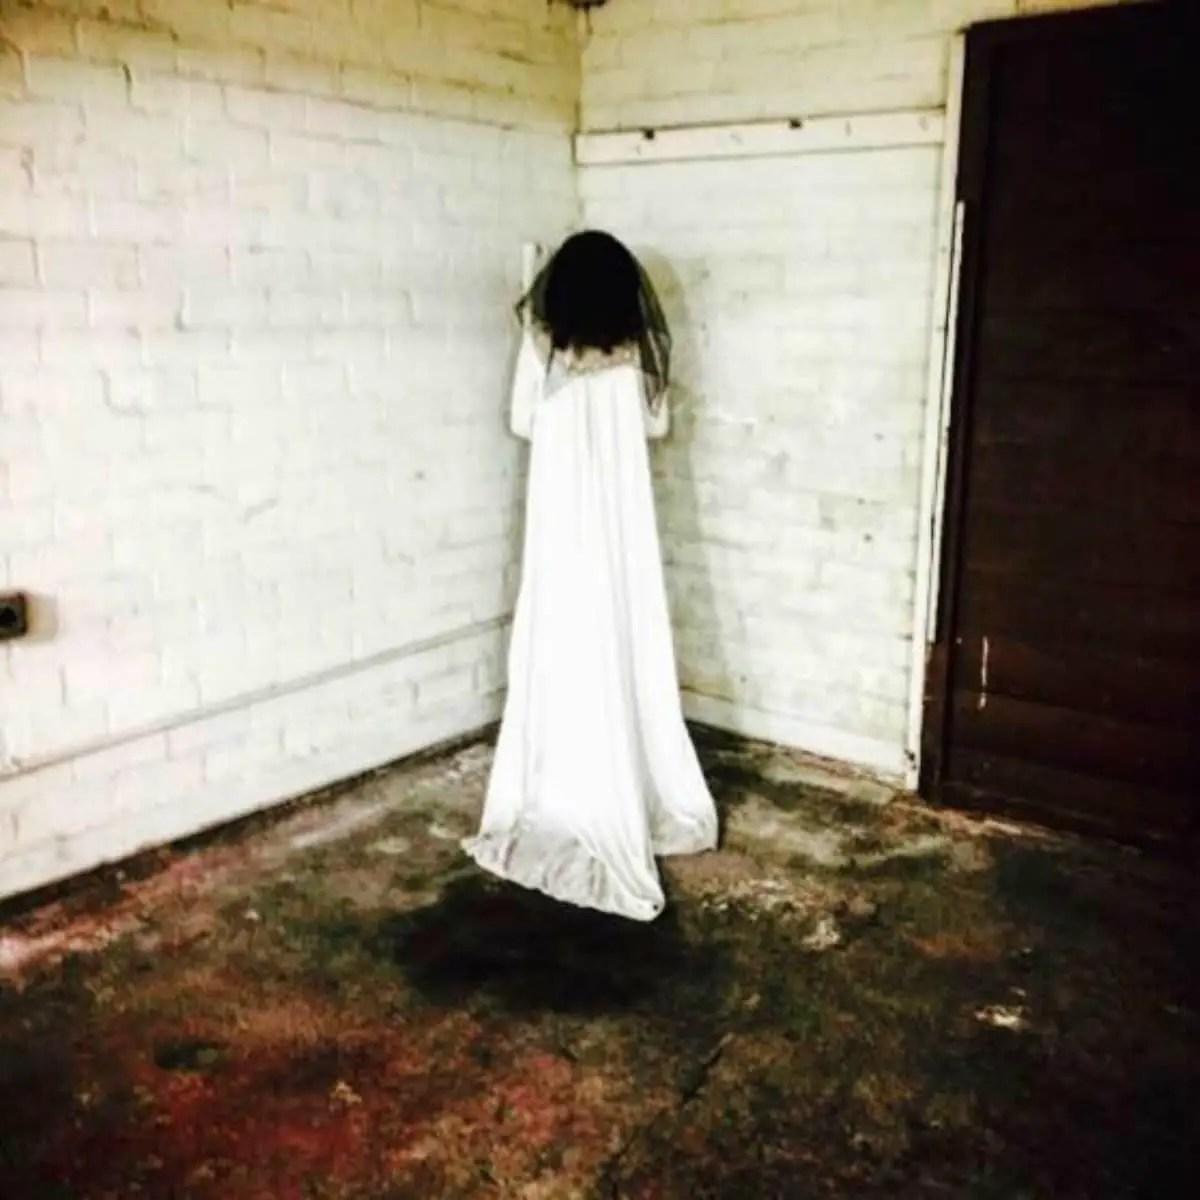 Night Shift DTLA - Immersive Haunt Escape Room - Los Angeles Haunted House